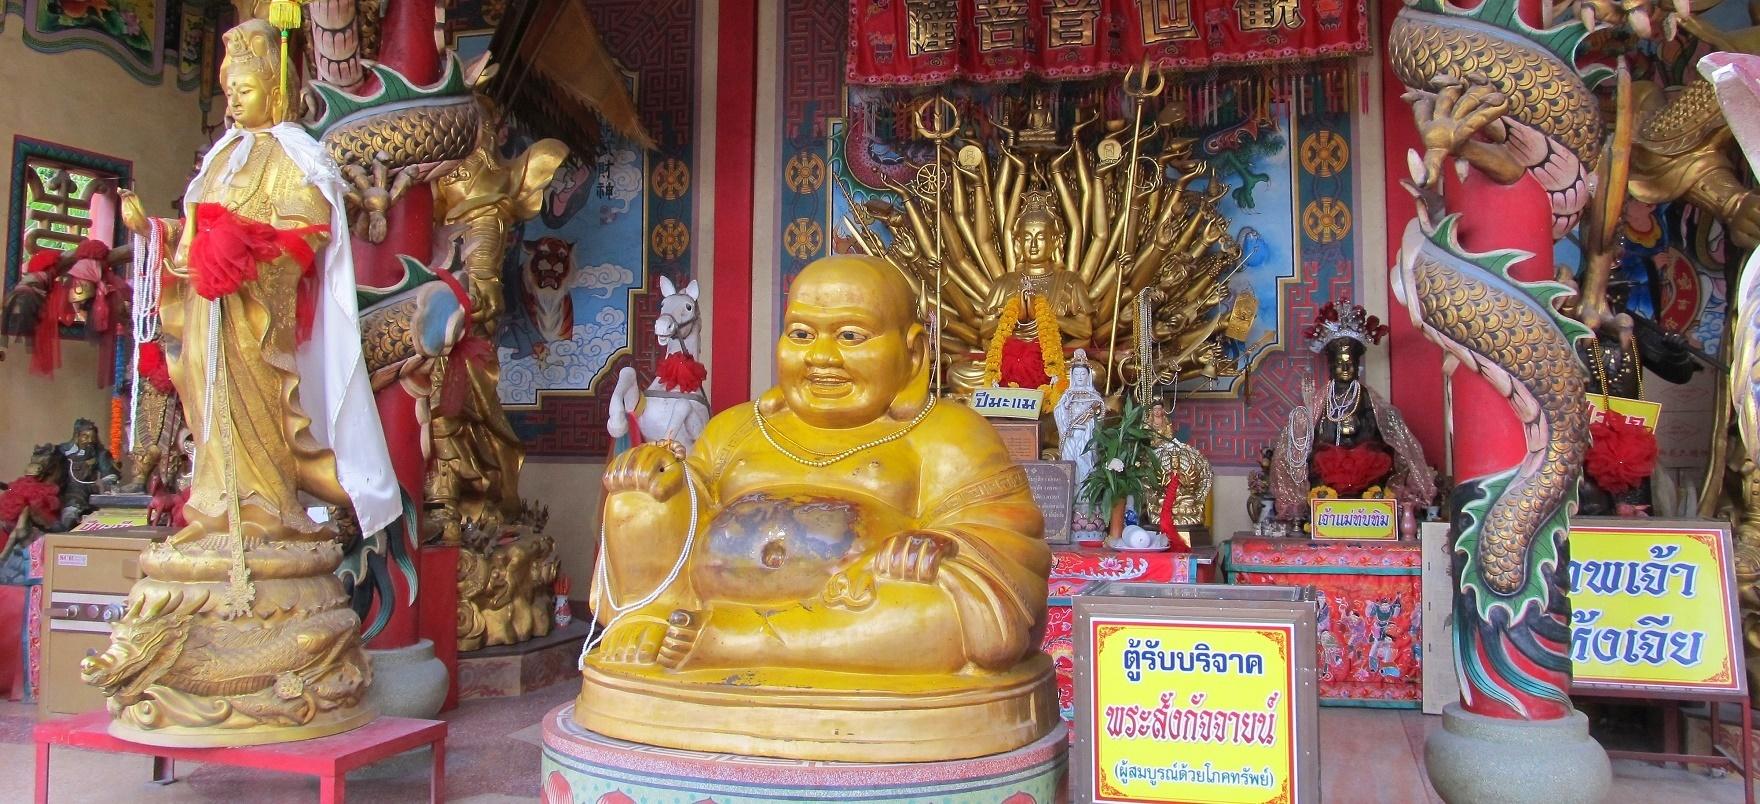 Čínský Buddha - Wat Phanan Choeng Worawihan - Ayutthaya - Thajsko